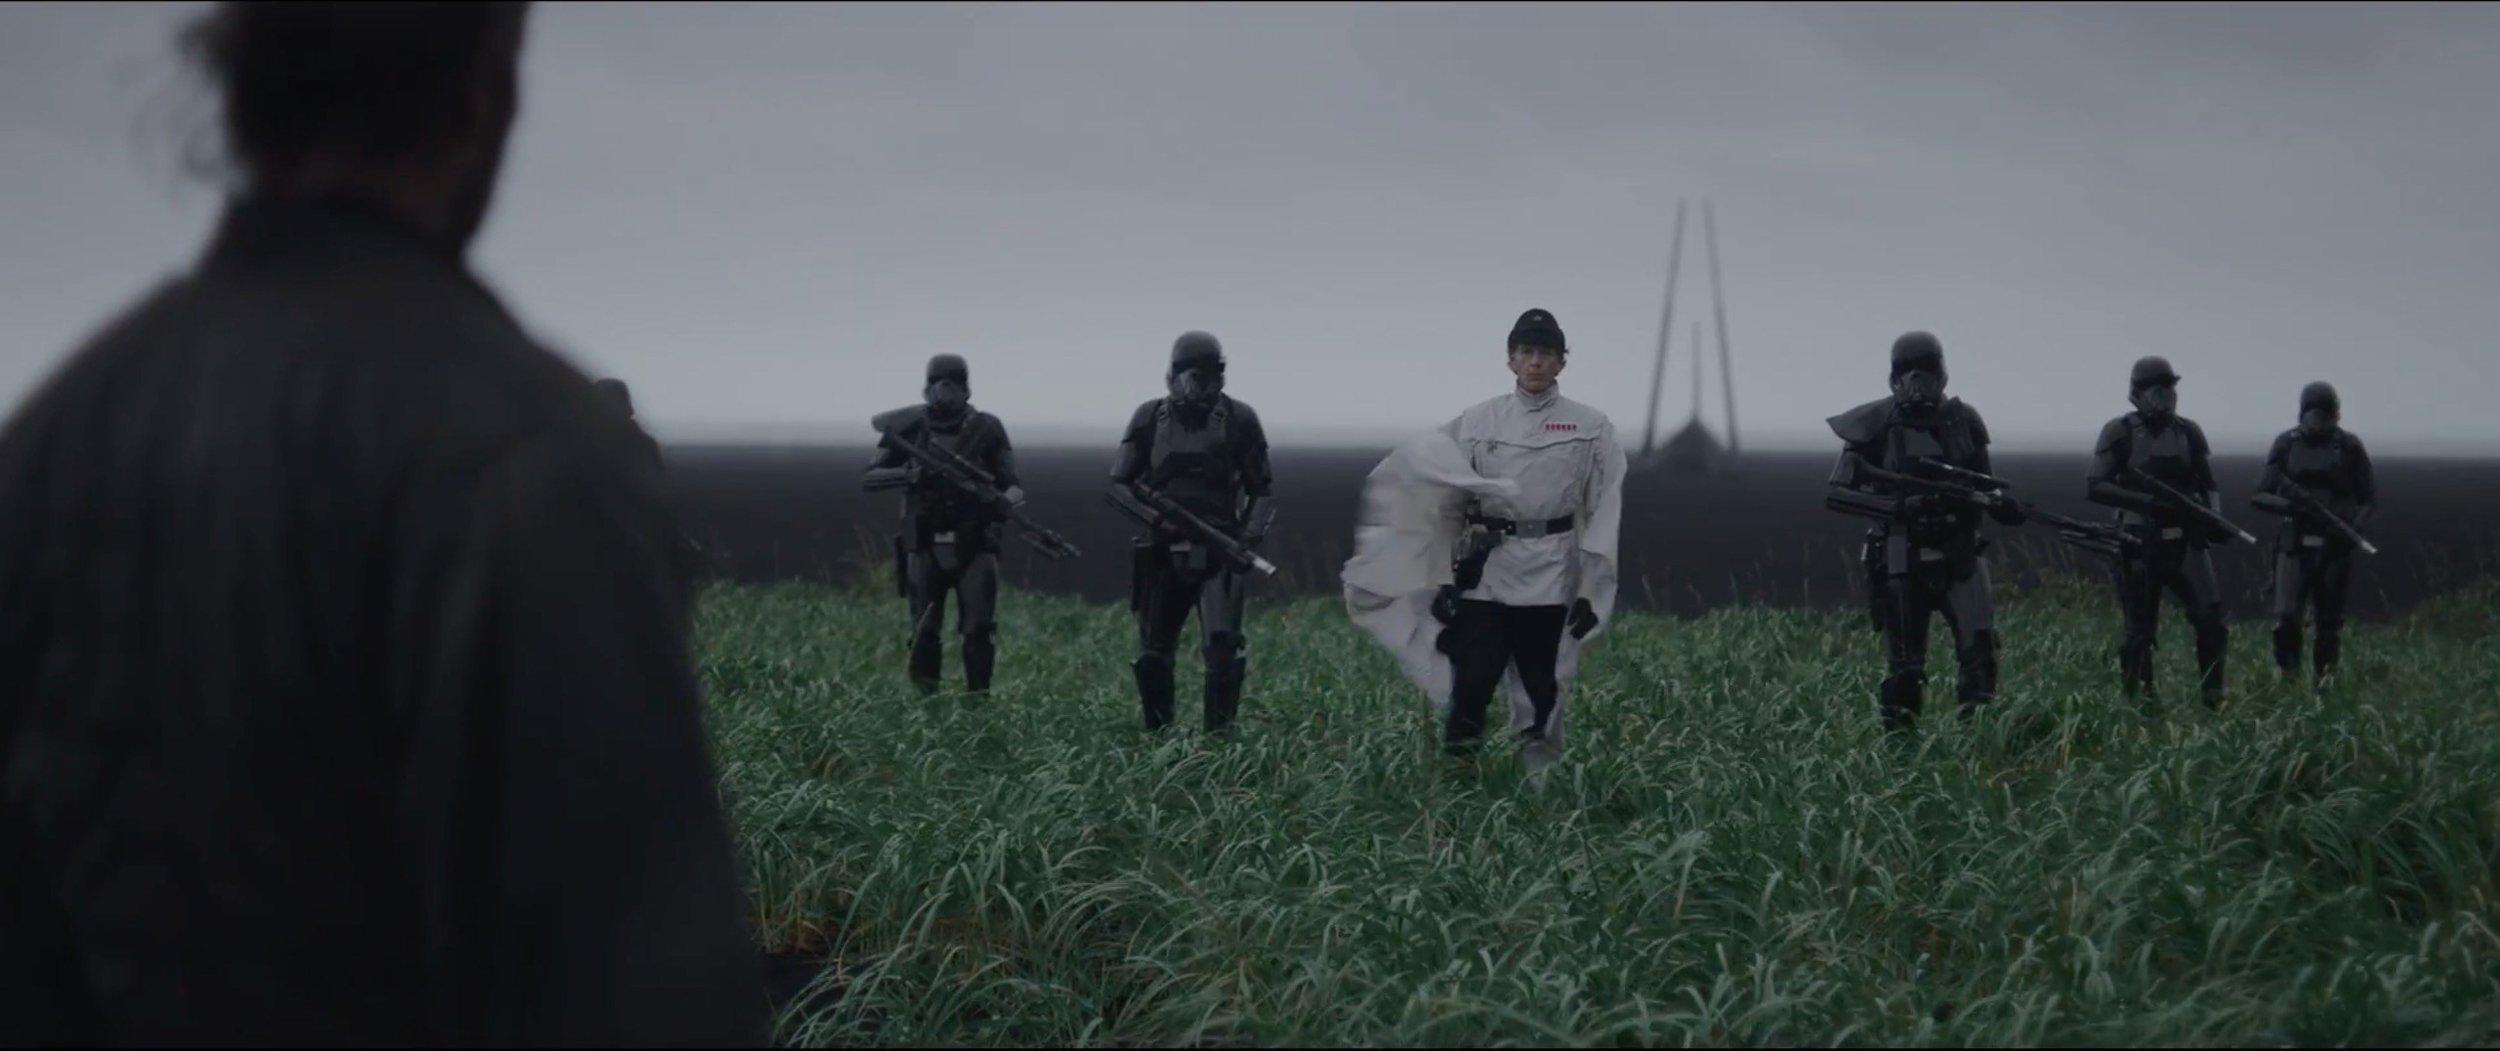 Rogue-One-Star-Wars-6.jpg